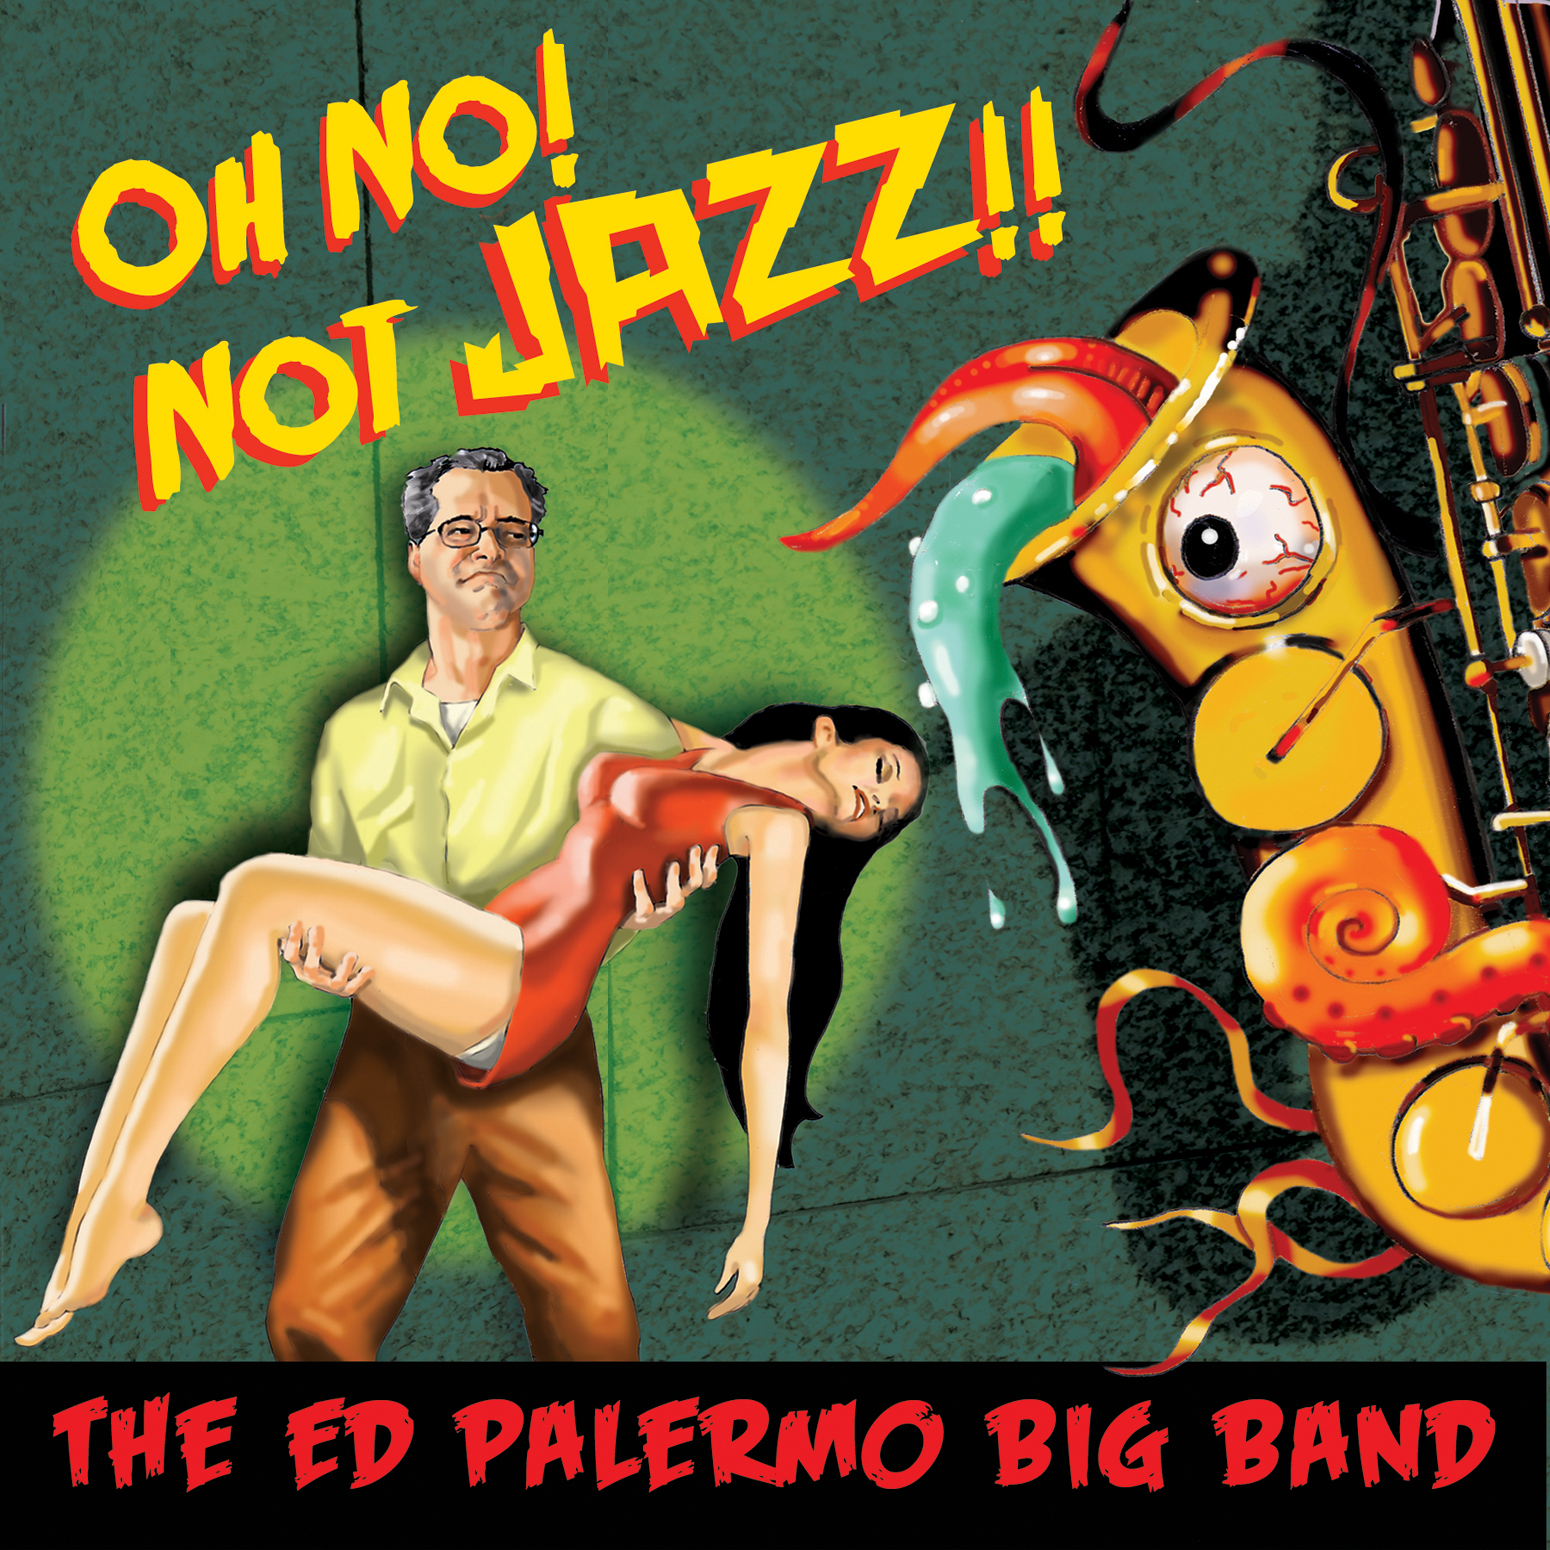 Original Dixieland Jazz Band - Original Dixieland Jazz Band In England